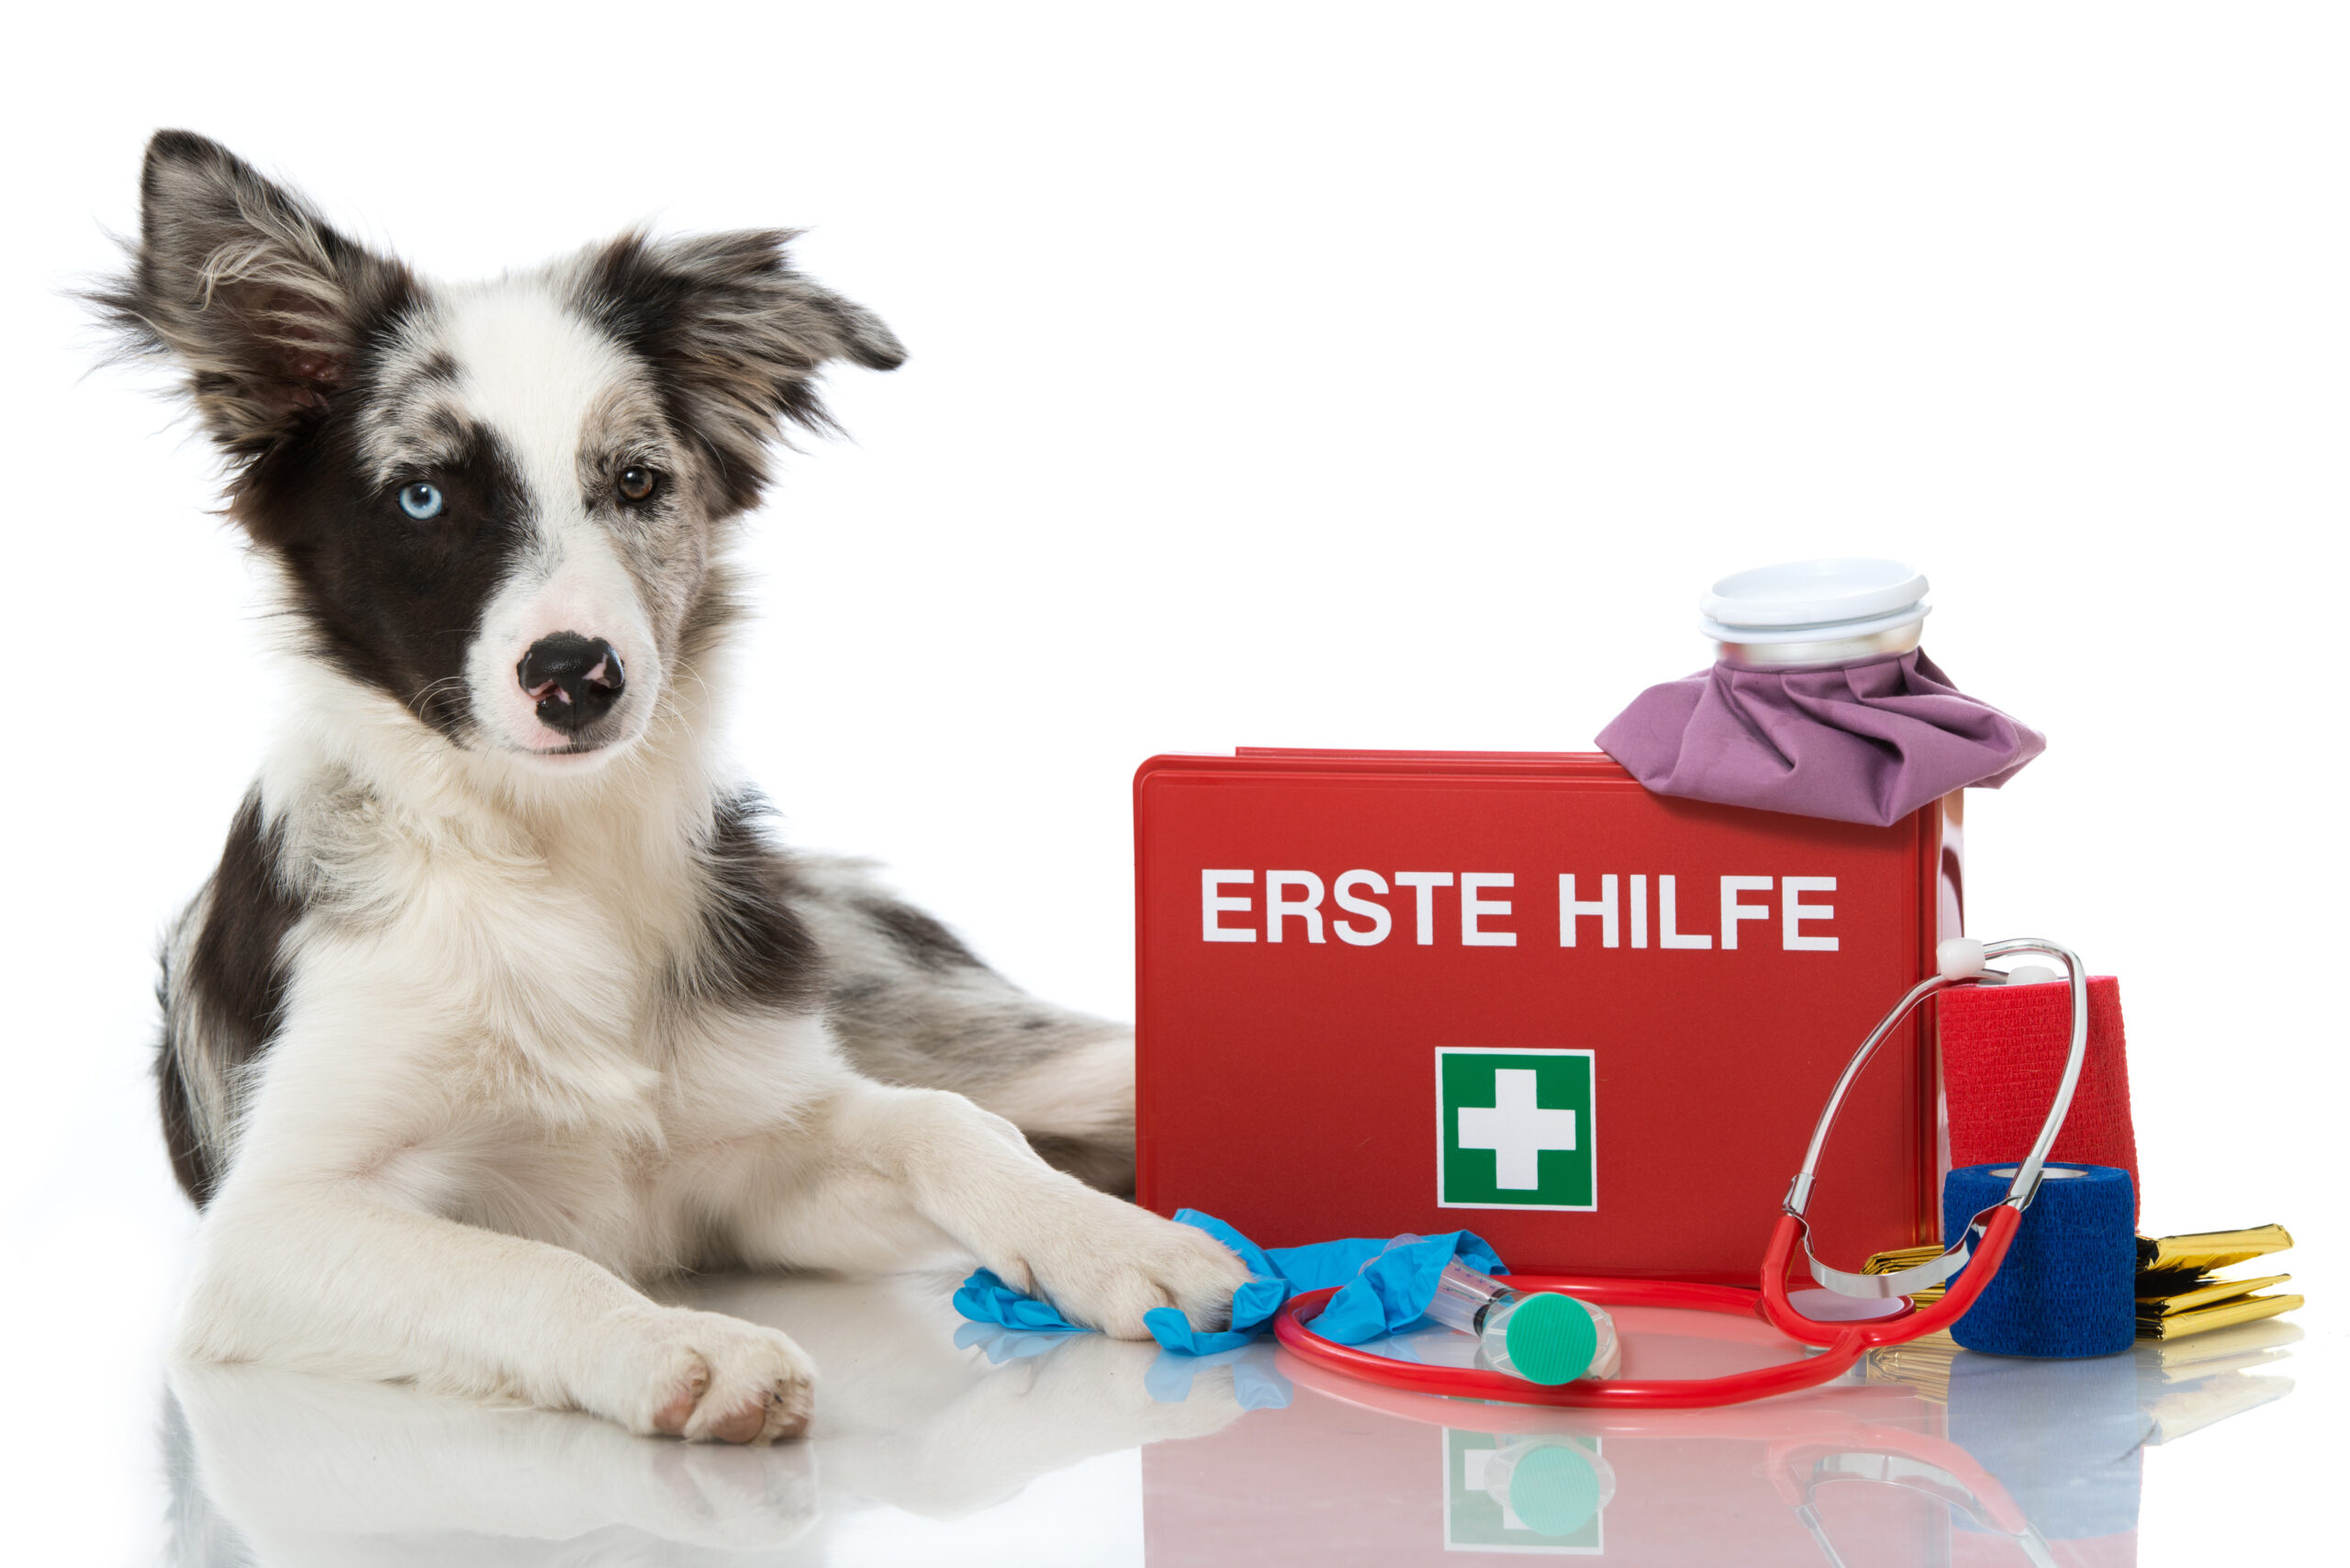 Erste- Hilfe- Kurs für Hunde post thumbnail